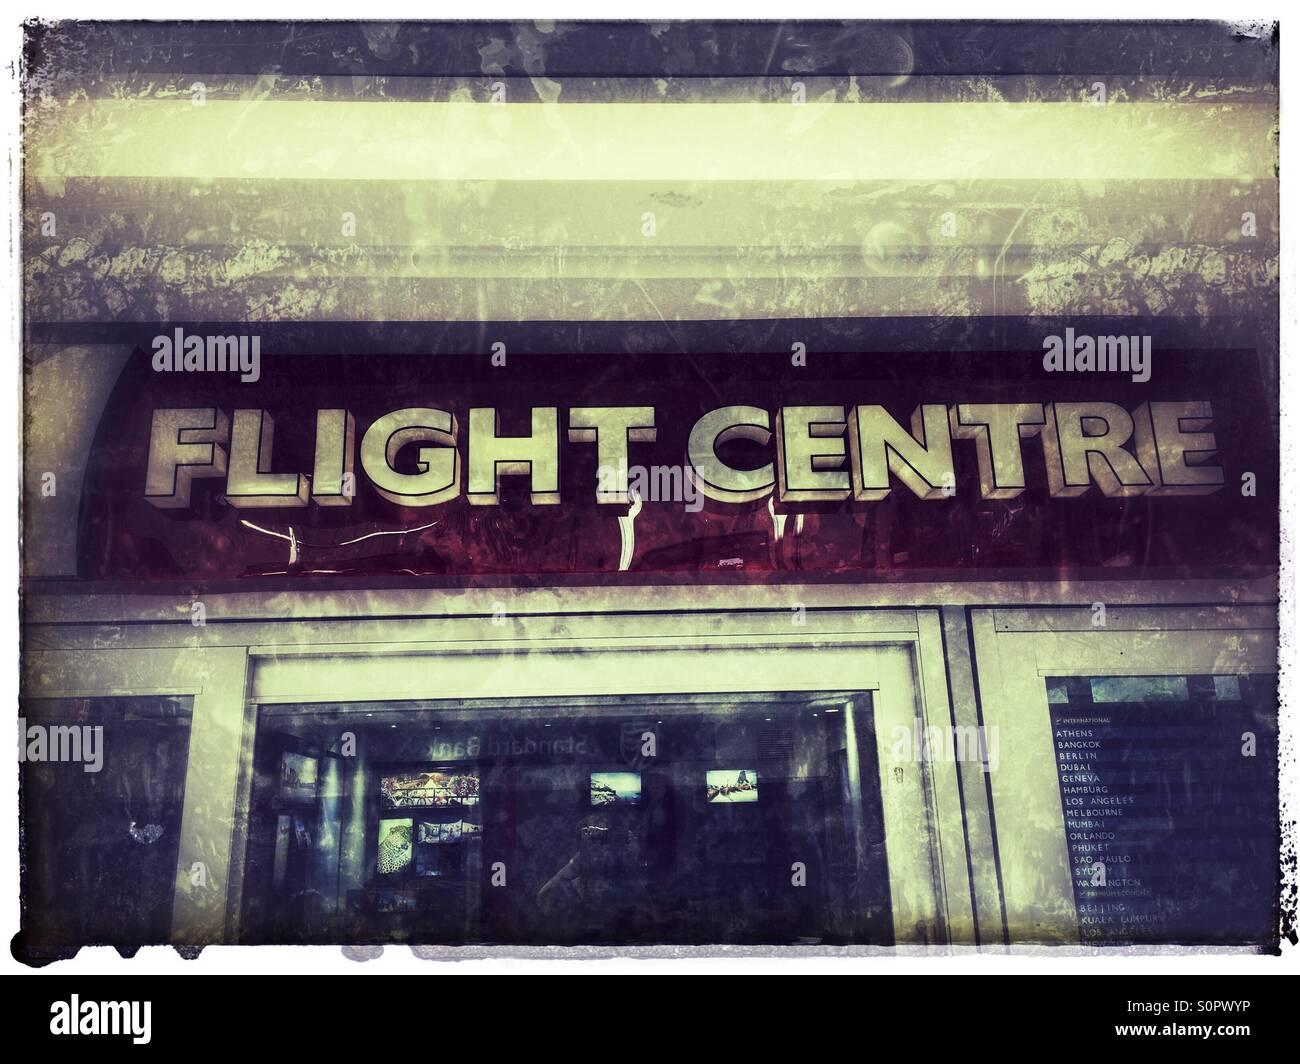 Flight centre travel agency . - Stock Image